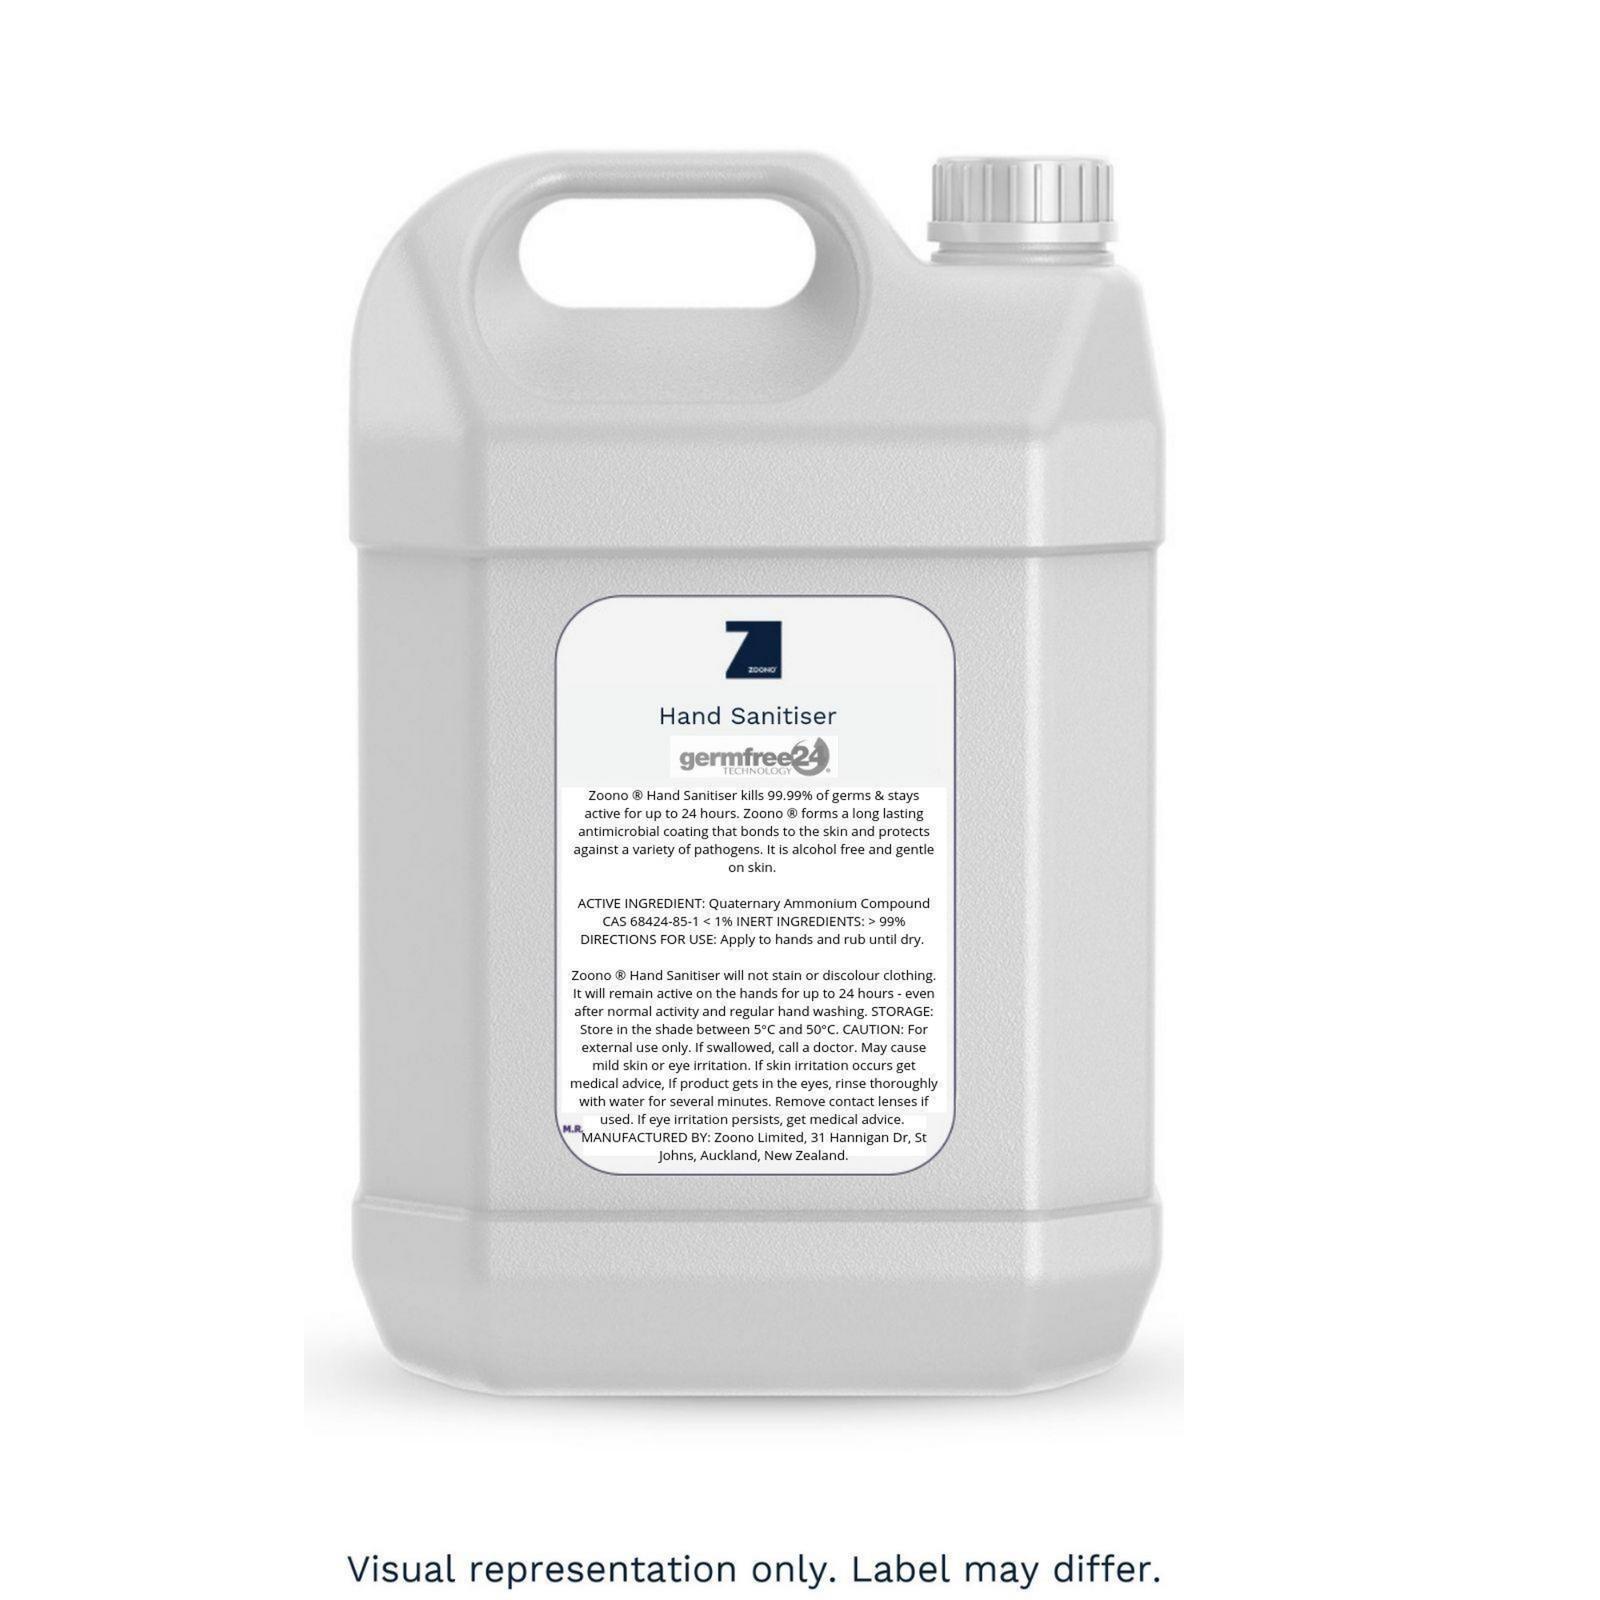 Zoono 24 hour Hand Sanitiser 5L